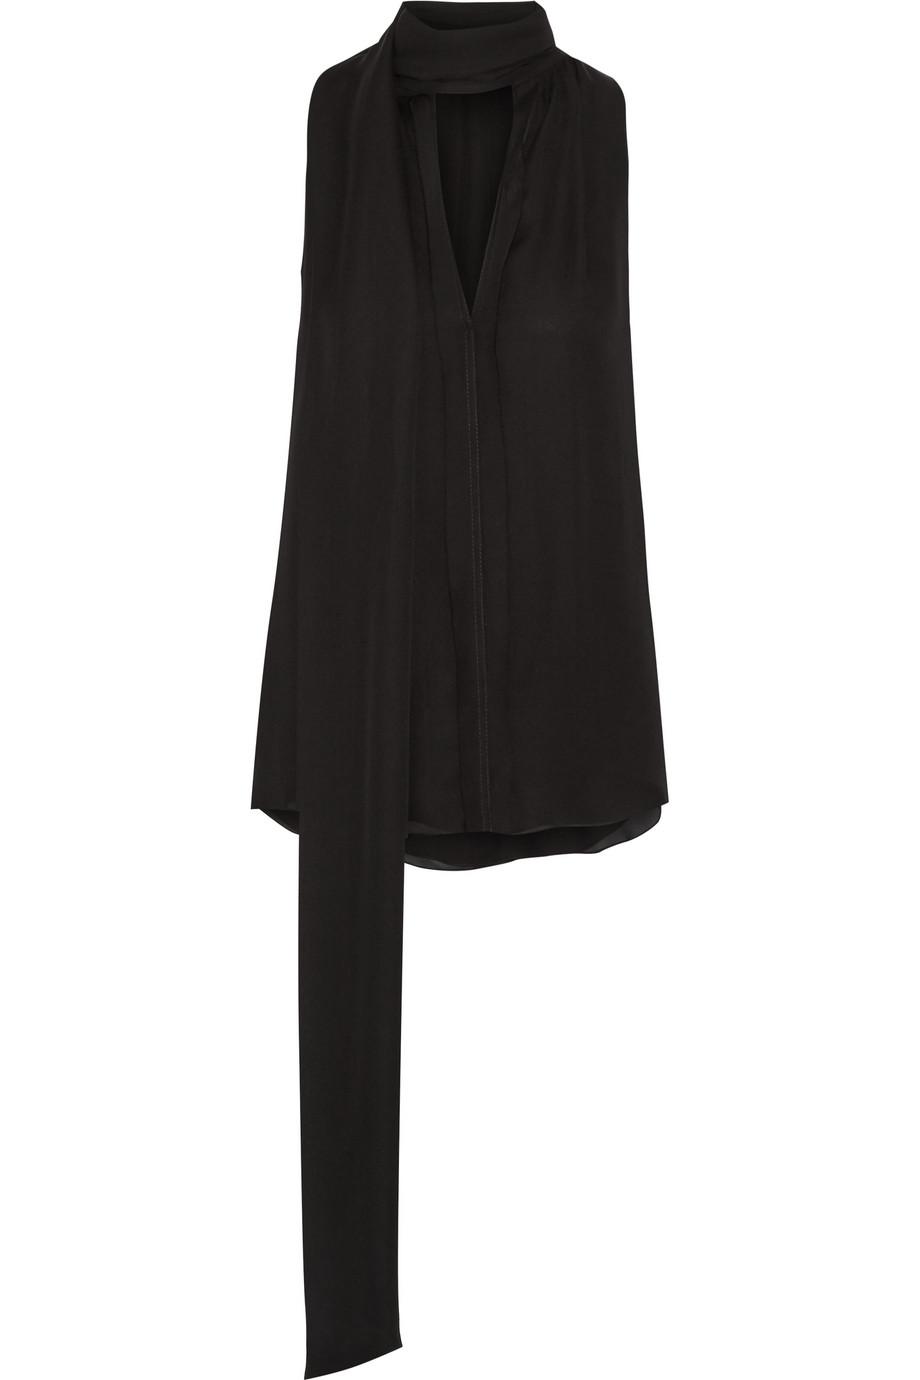 House Draped Silk-Georgette Top, Black, Women's, Size: 2